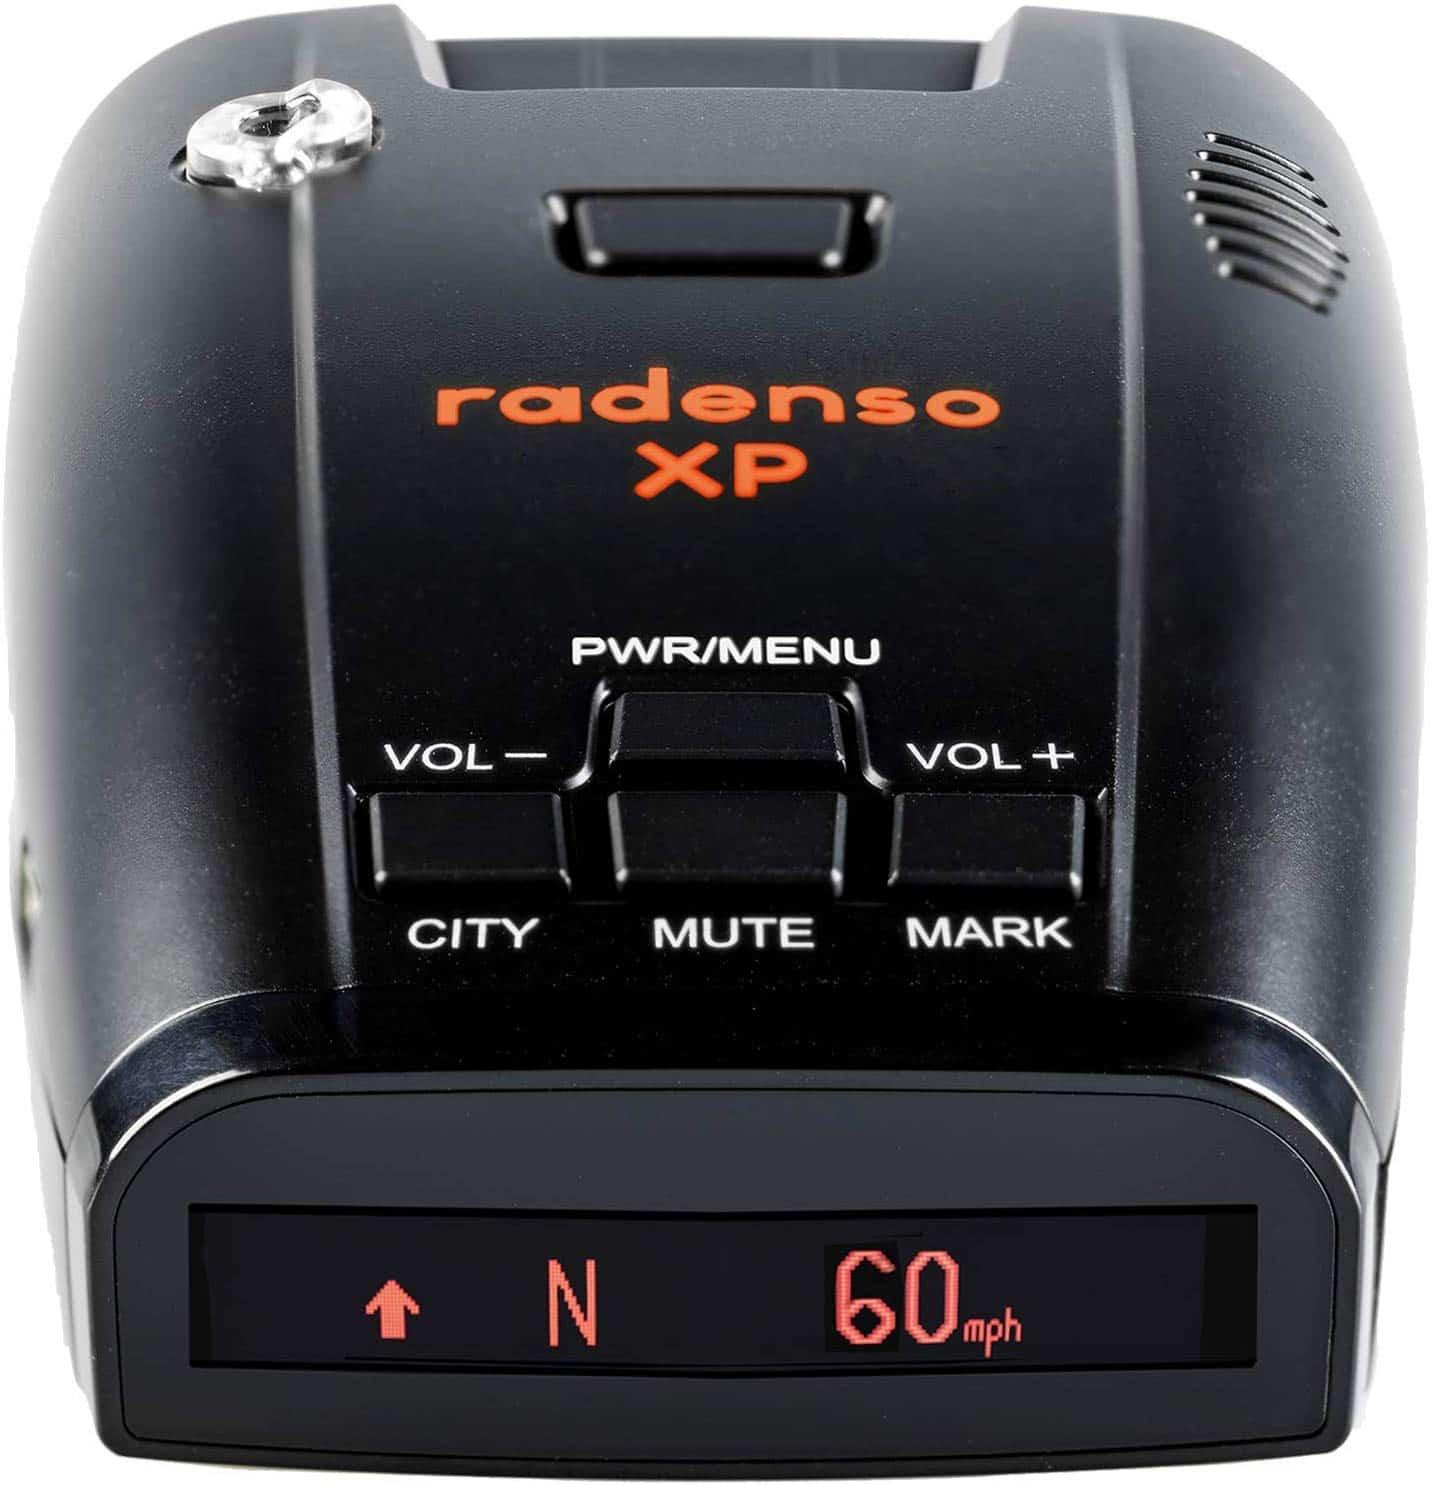 Best Radar Detector Radenso XP Radar and Laser Detector